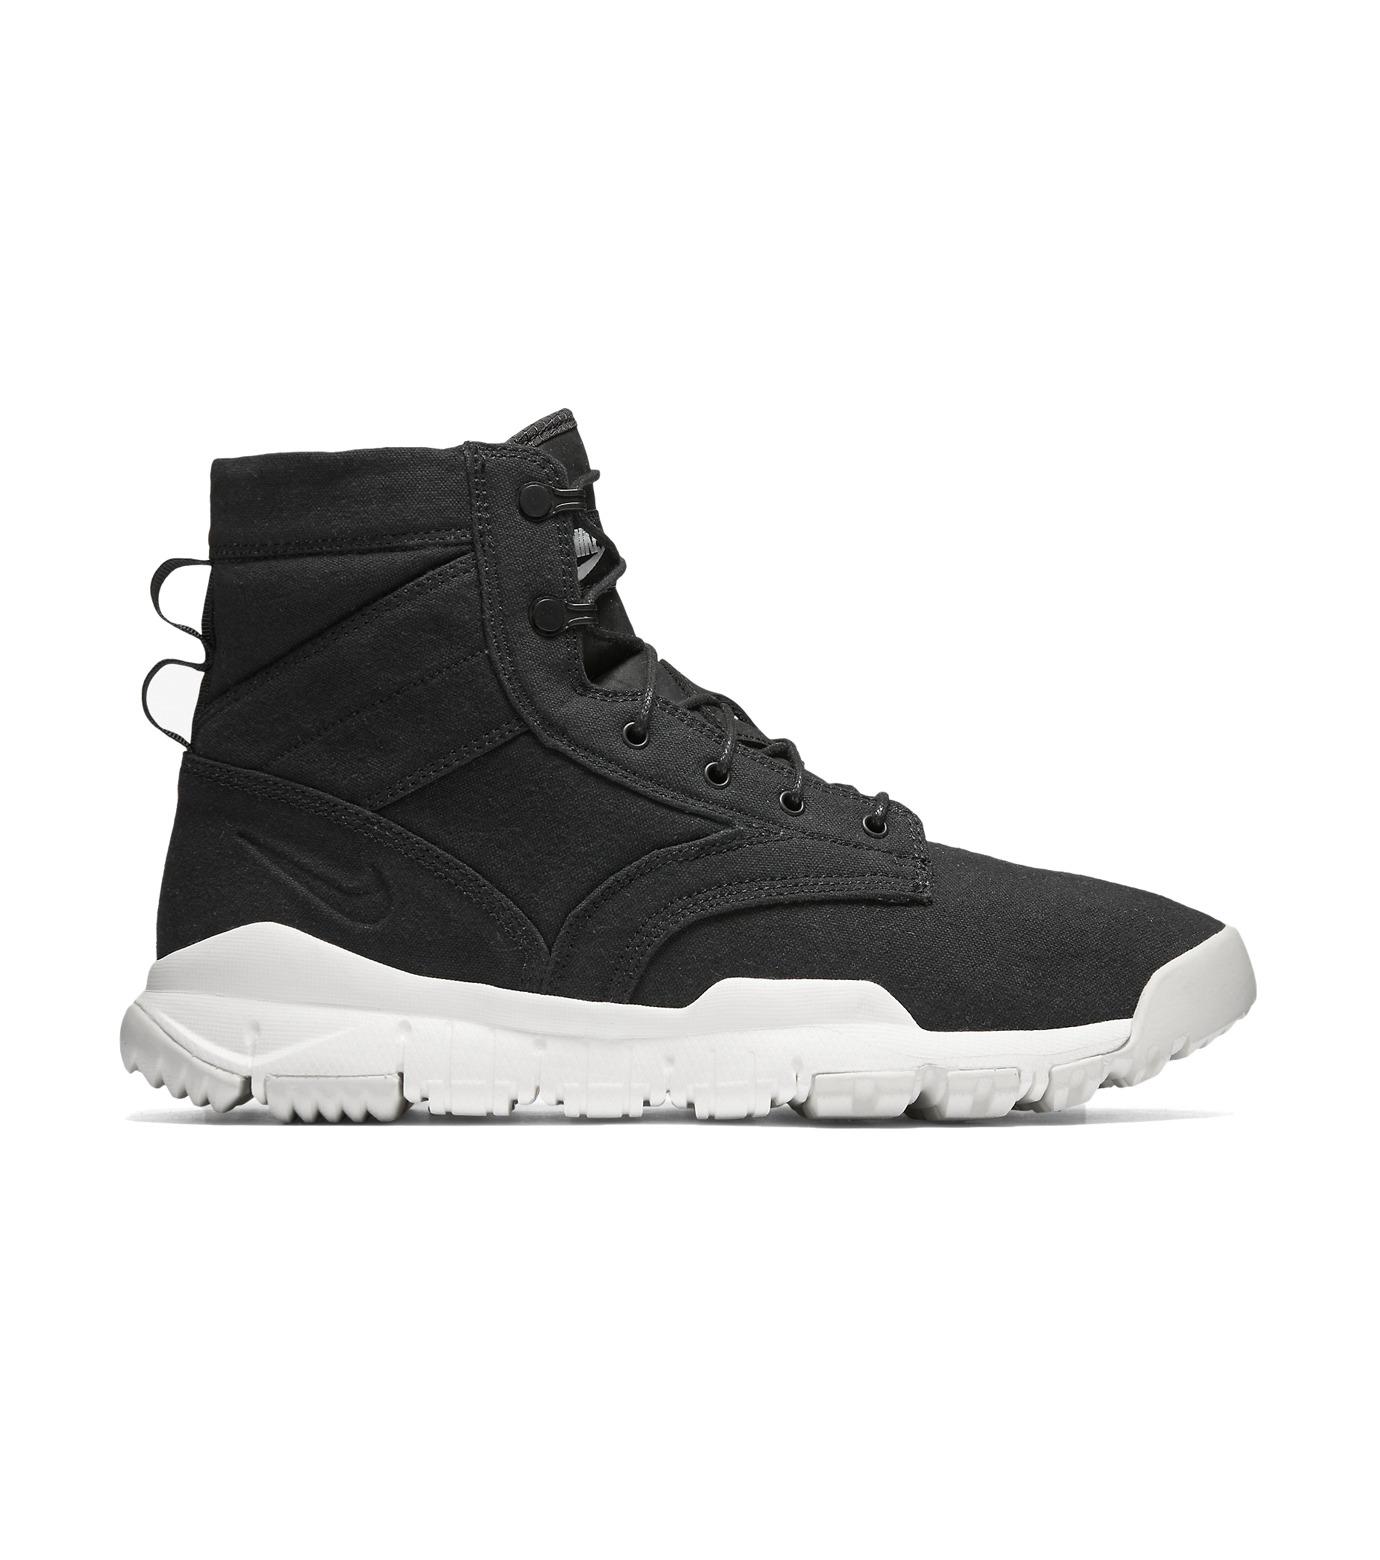 NIKE(ナイキ)のSFB FIELD 6 CANVAS NSW-BLACK(シューズ/shoes)-844577-001-13 拡大詳細画像1